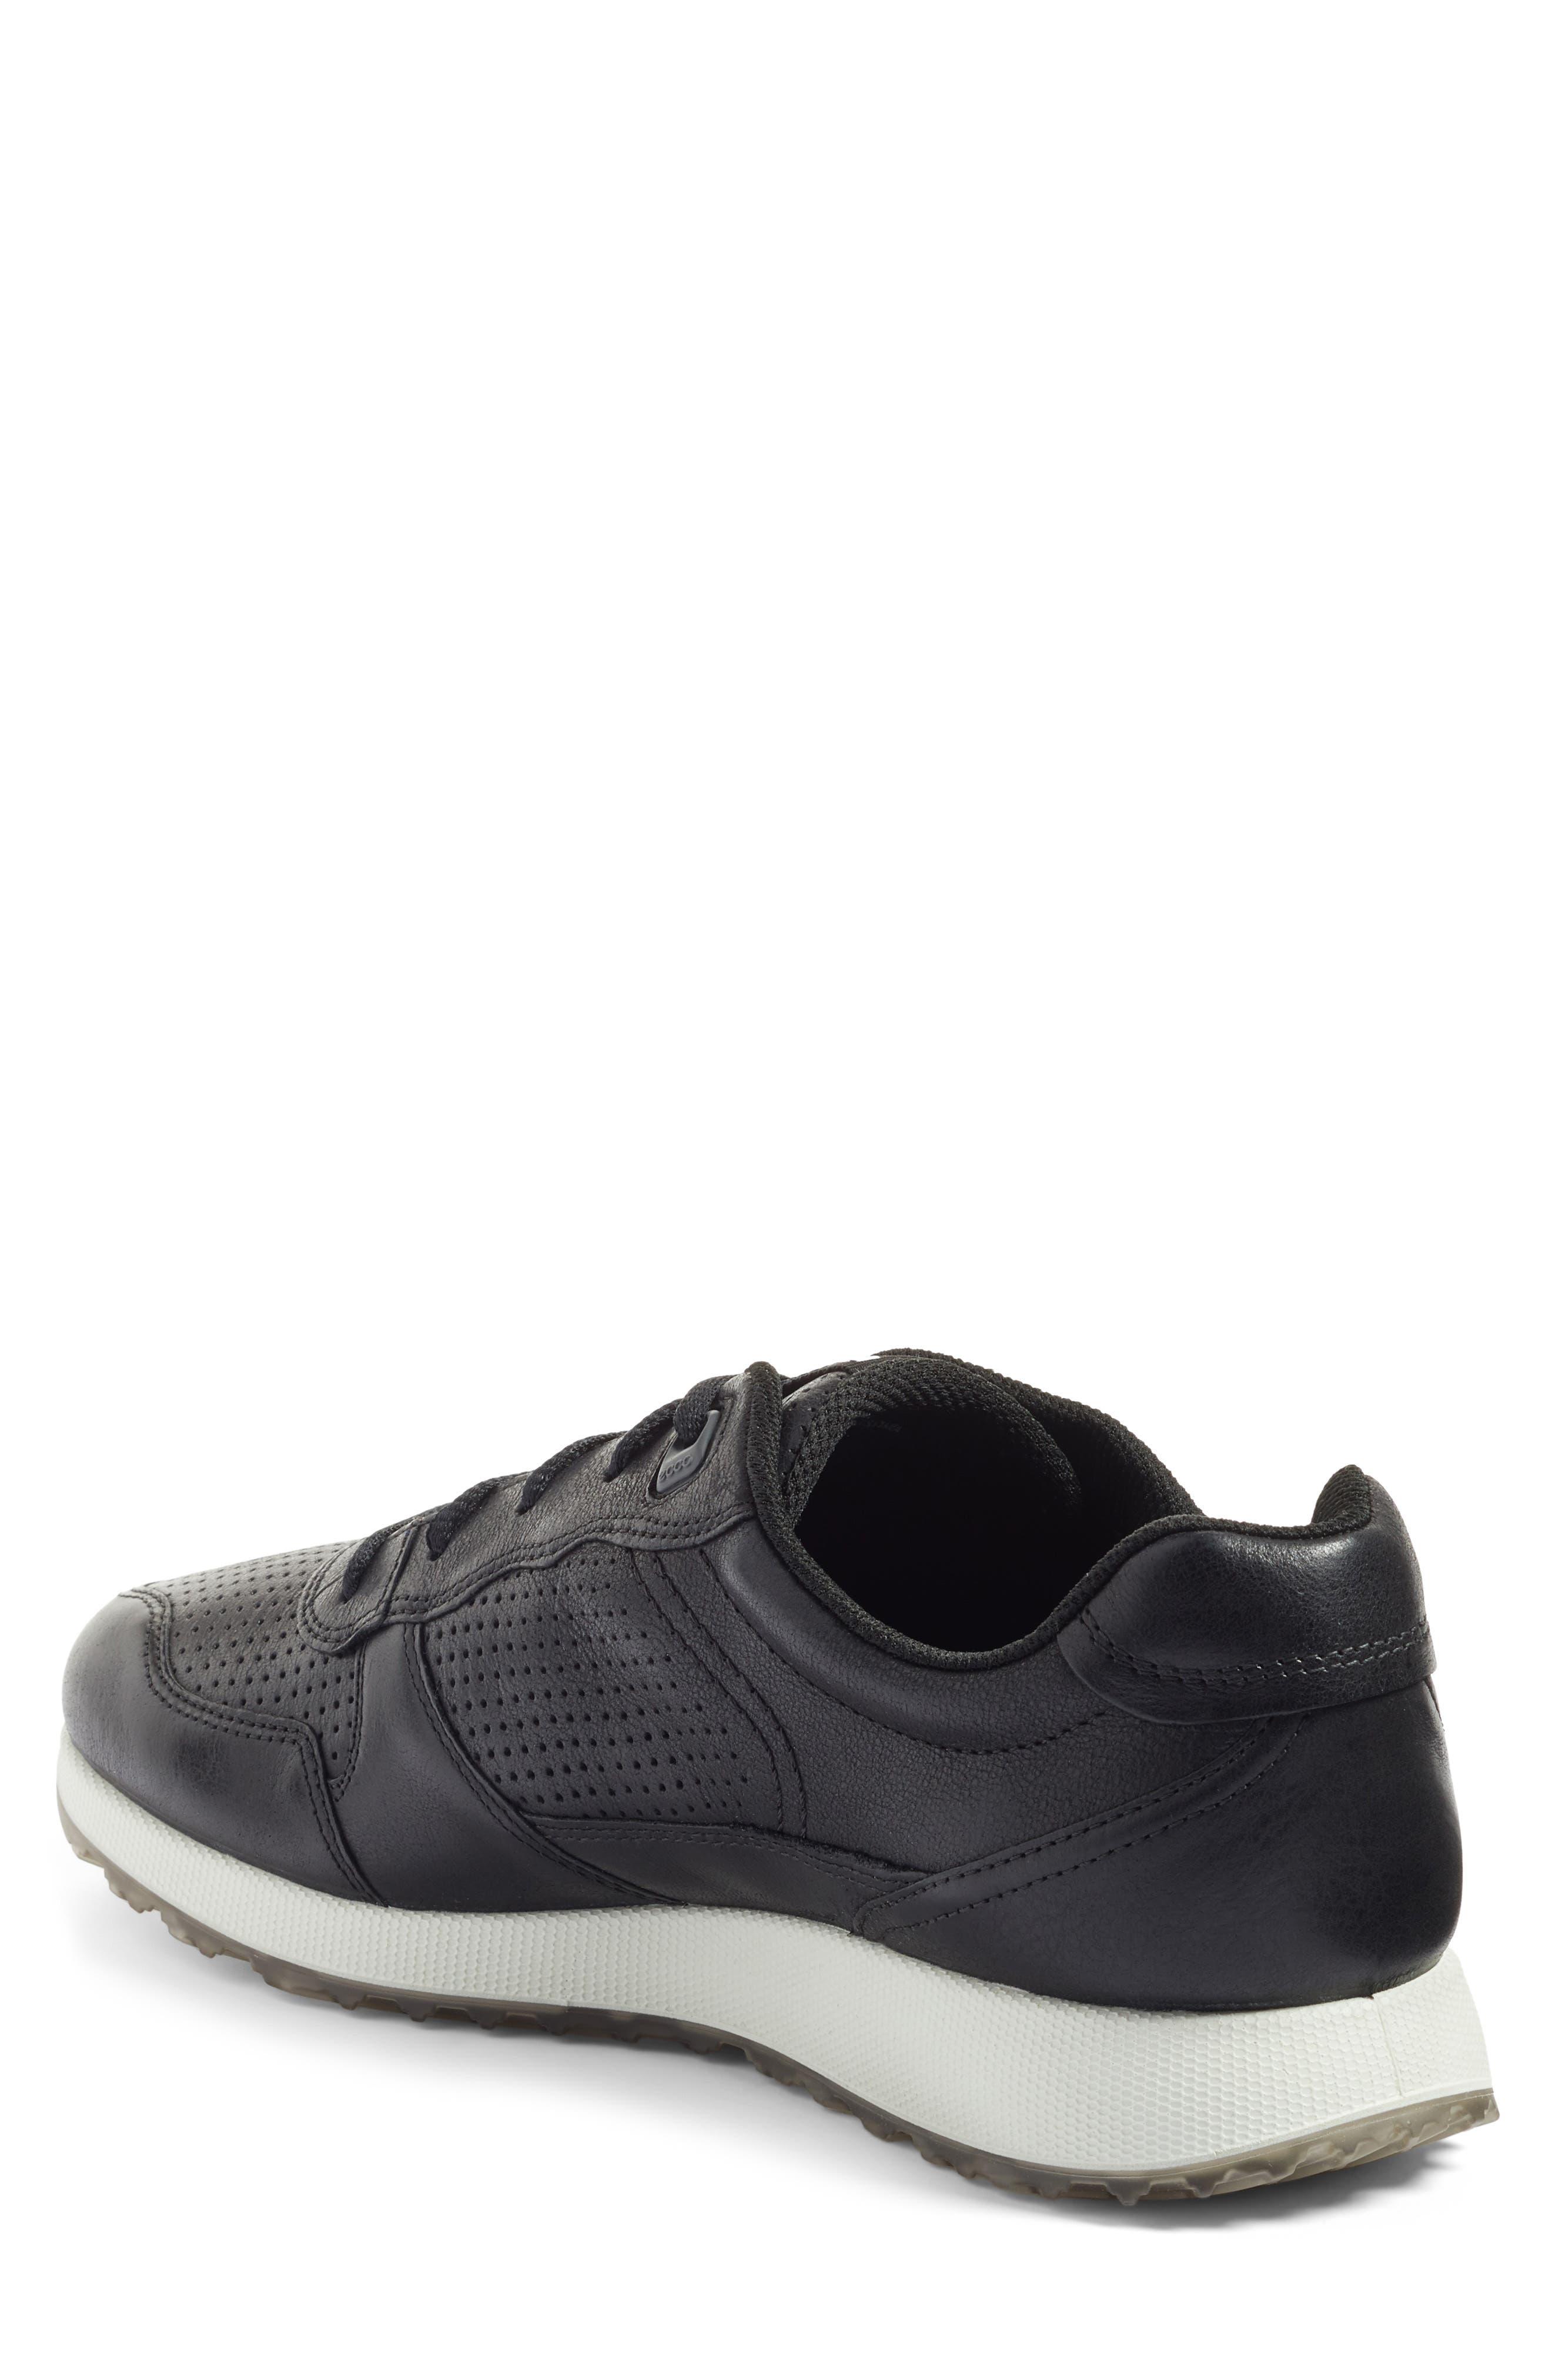 Sneak Sneaker,                             Alternate thumbnail 2, color,                             001